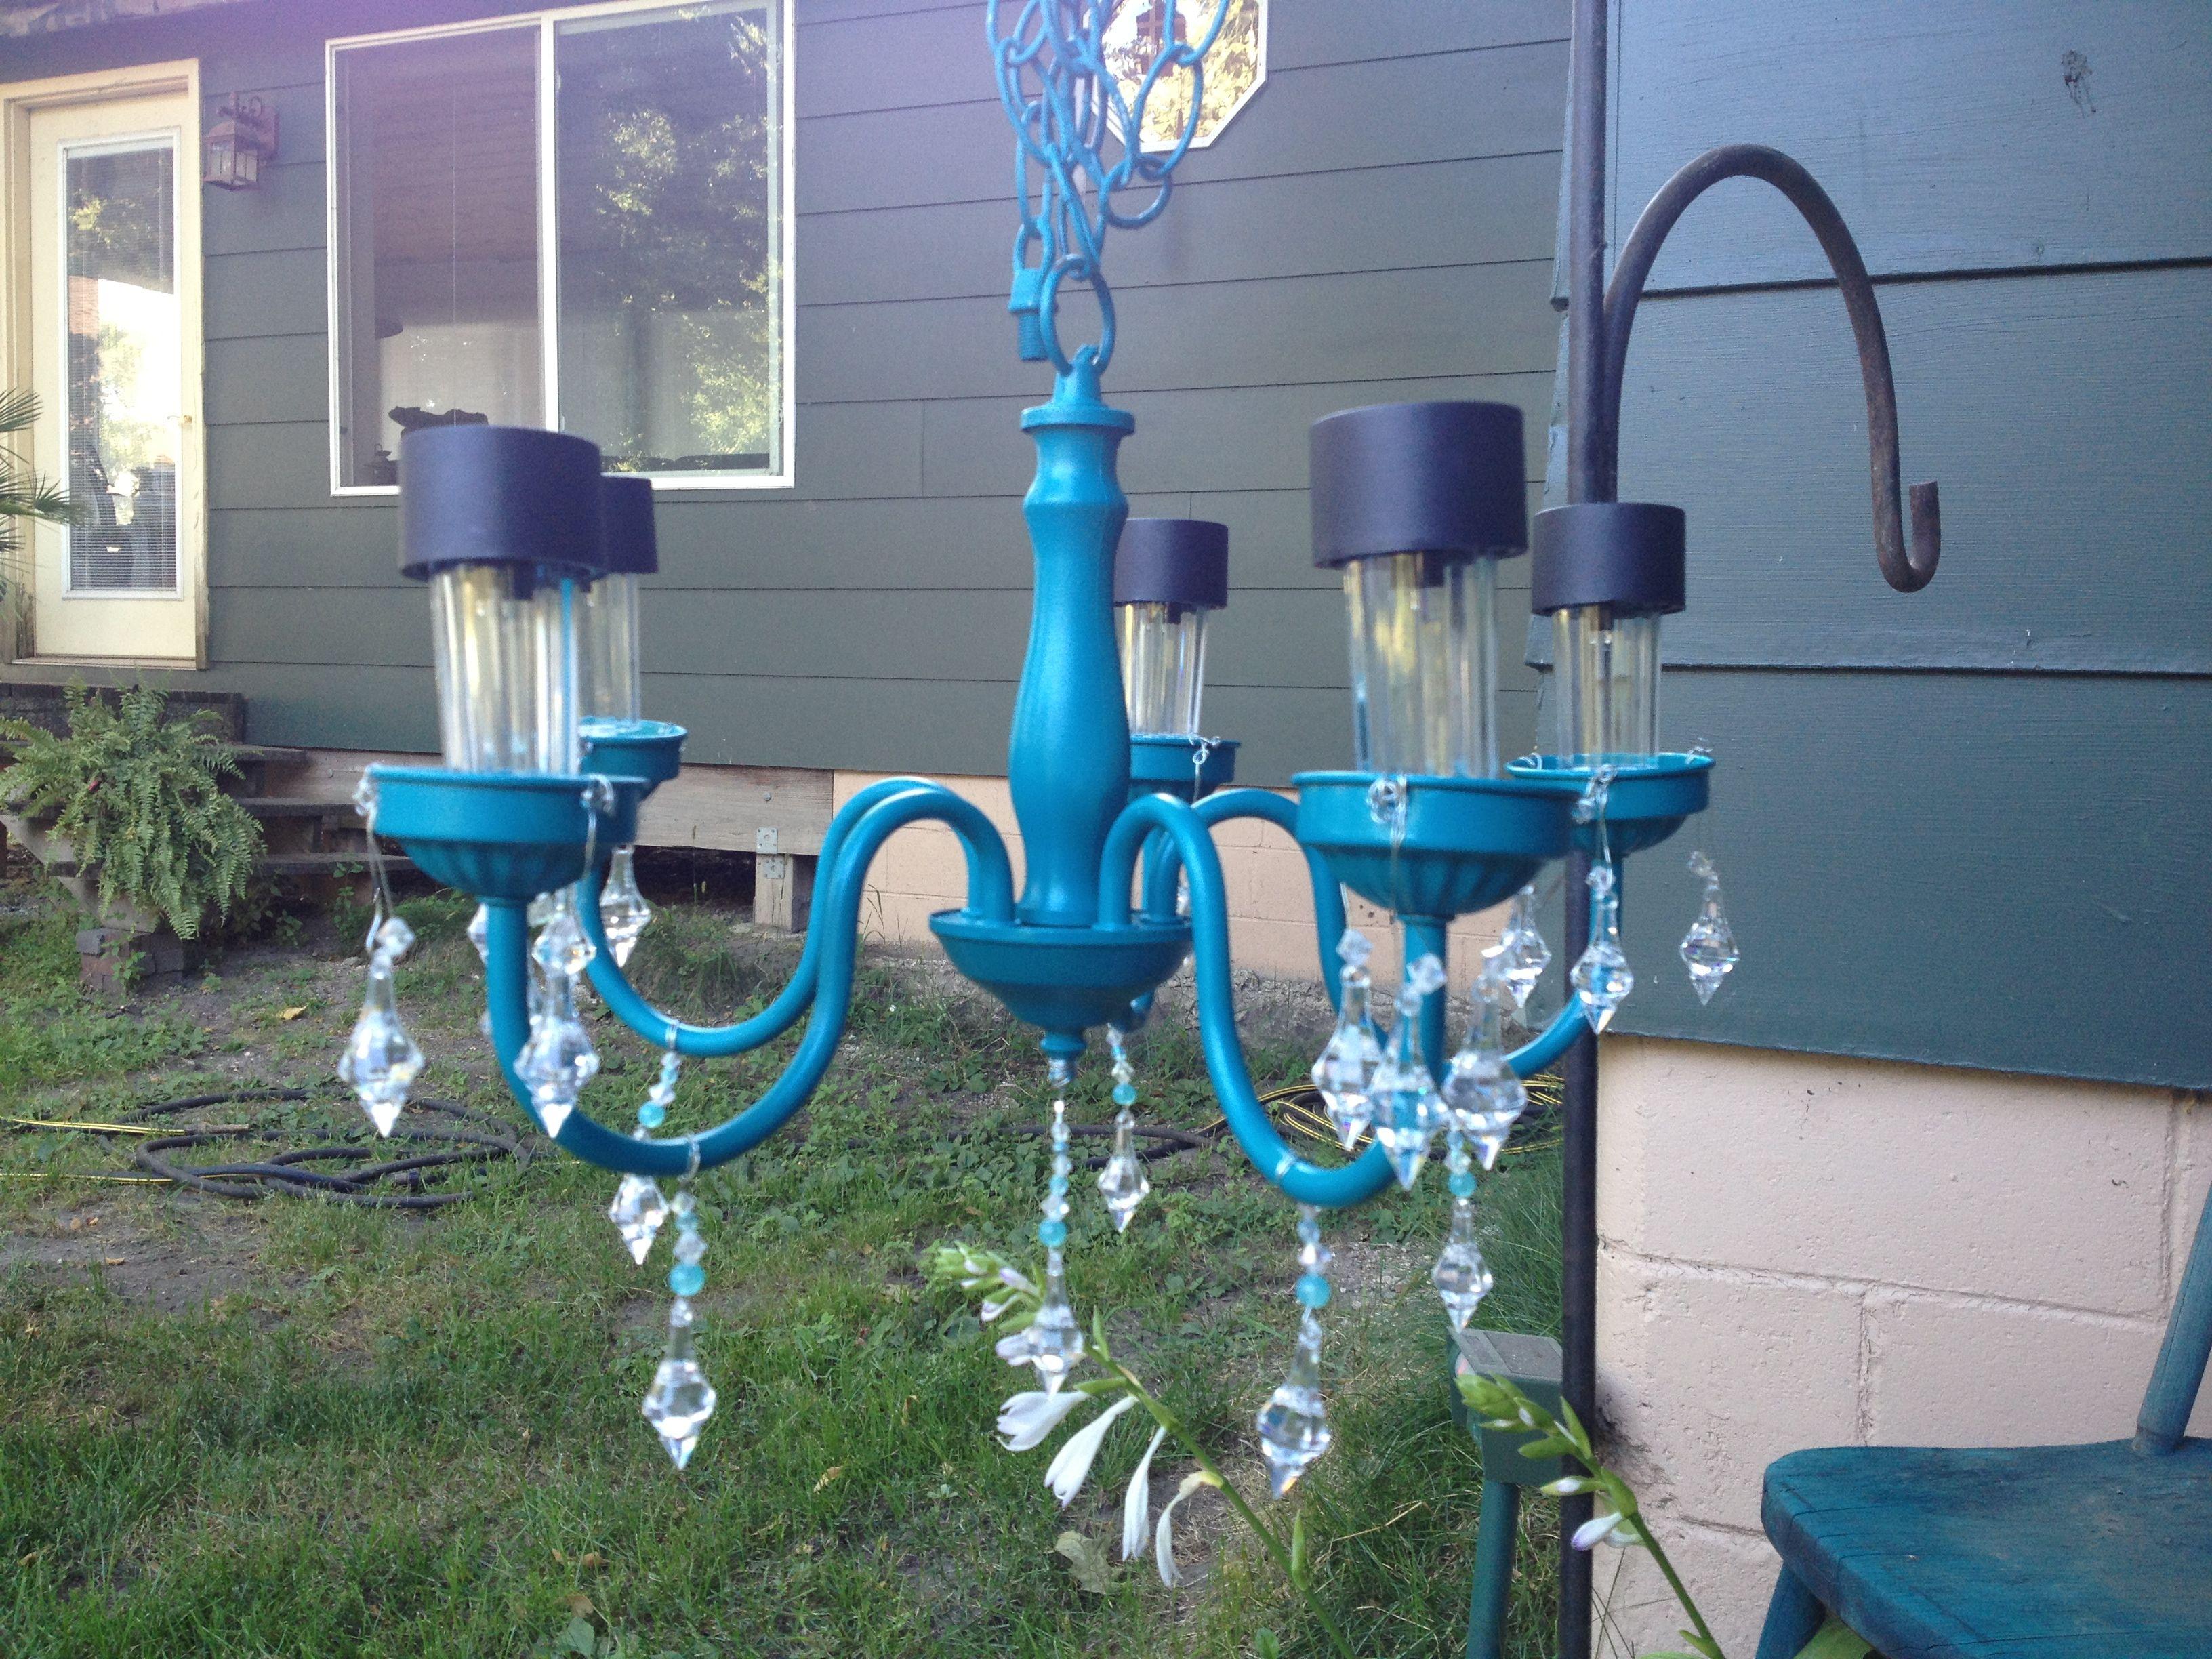 Solar light chandelier fashion i love pinterest for Solar light chandelier diy